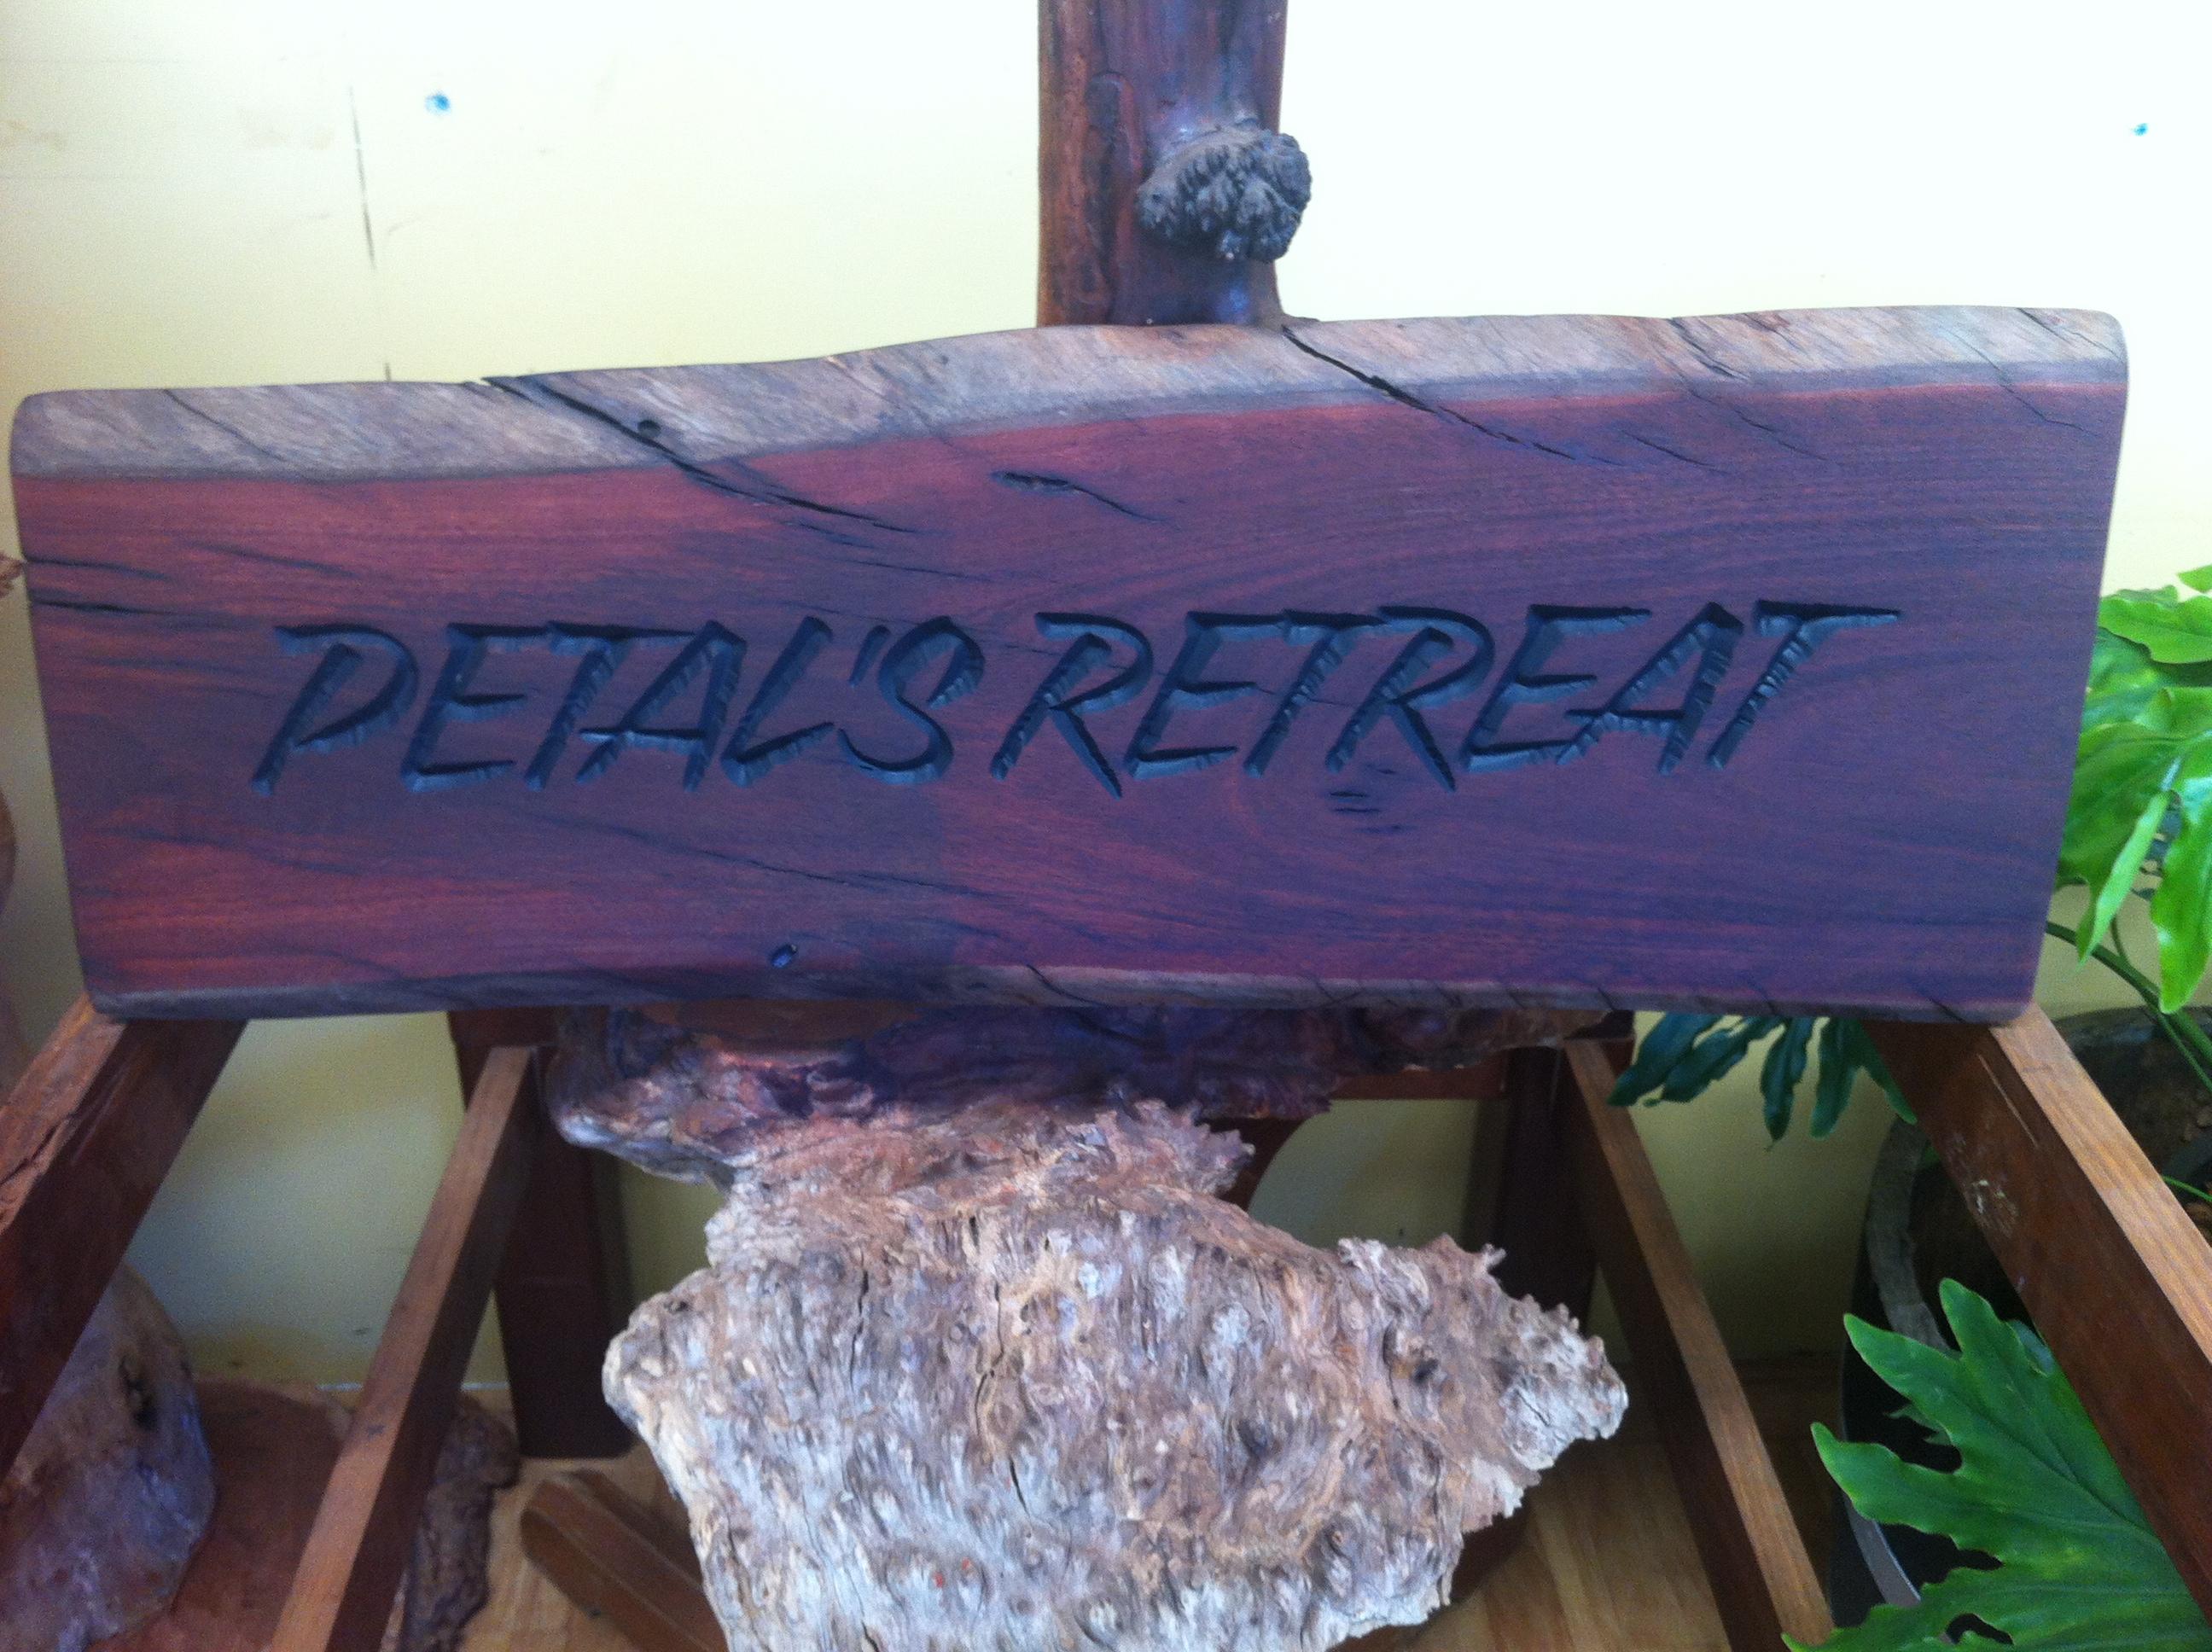 Petal's Retreat